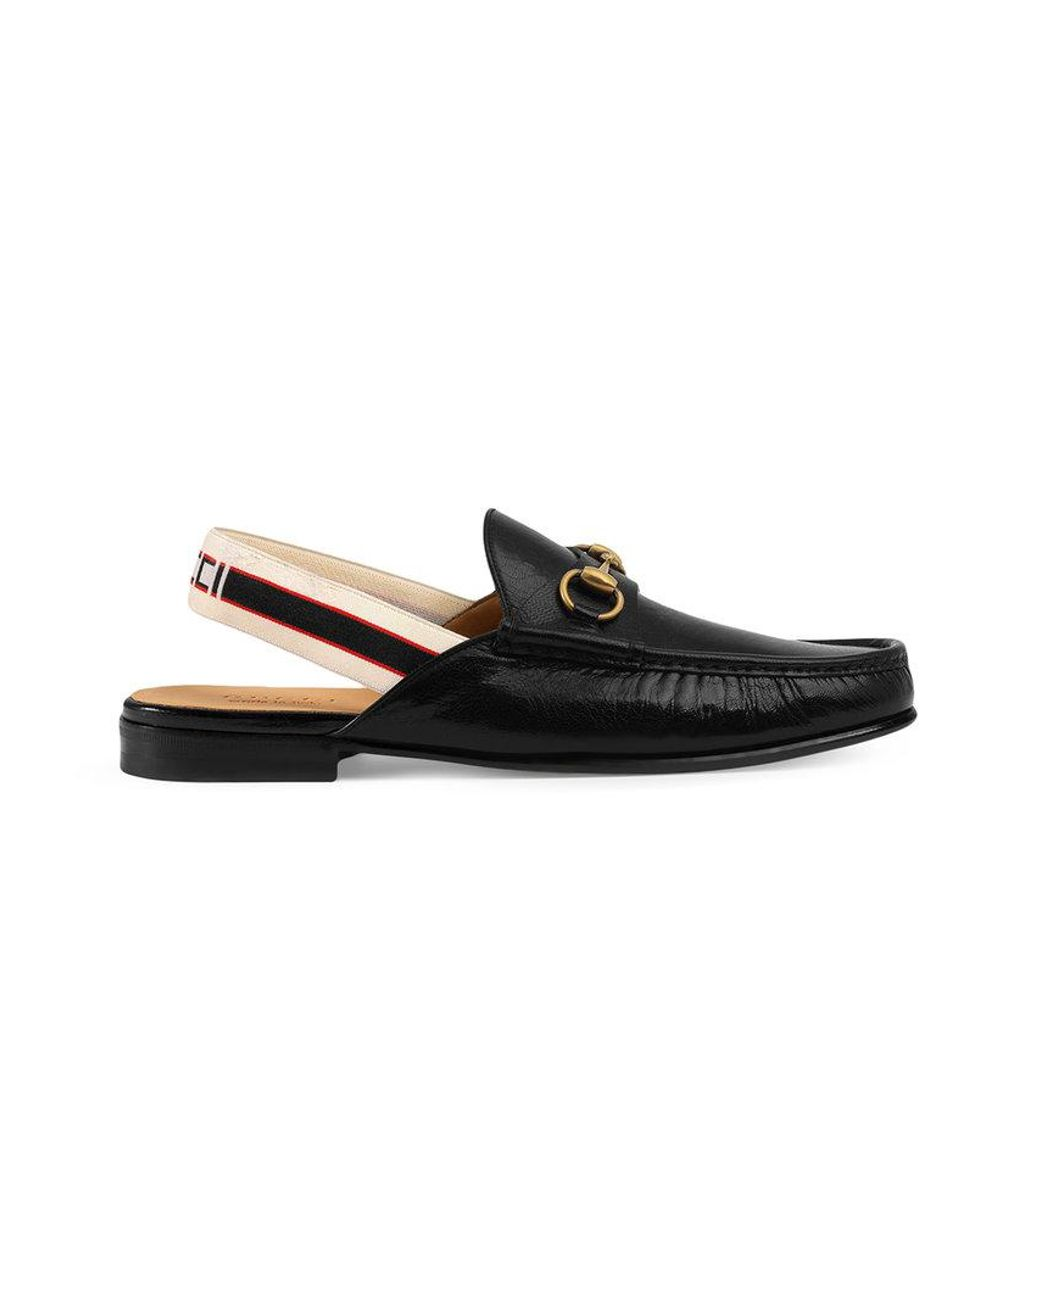 859e46e0b0f Lyst - Gucci Horsebit Stripe Slingback Slipper in Black for Men